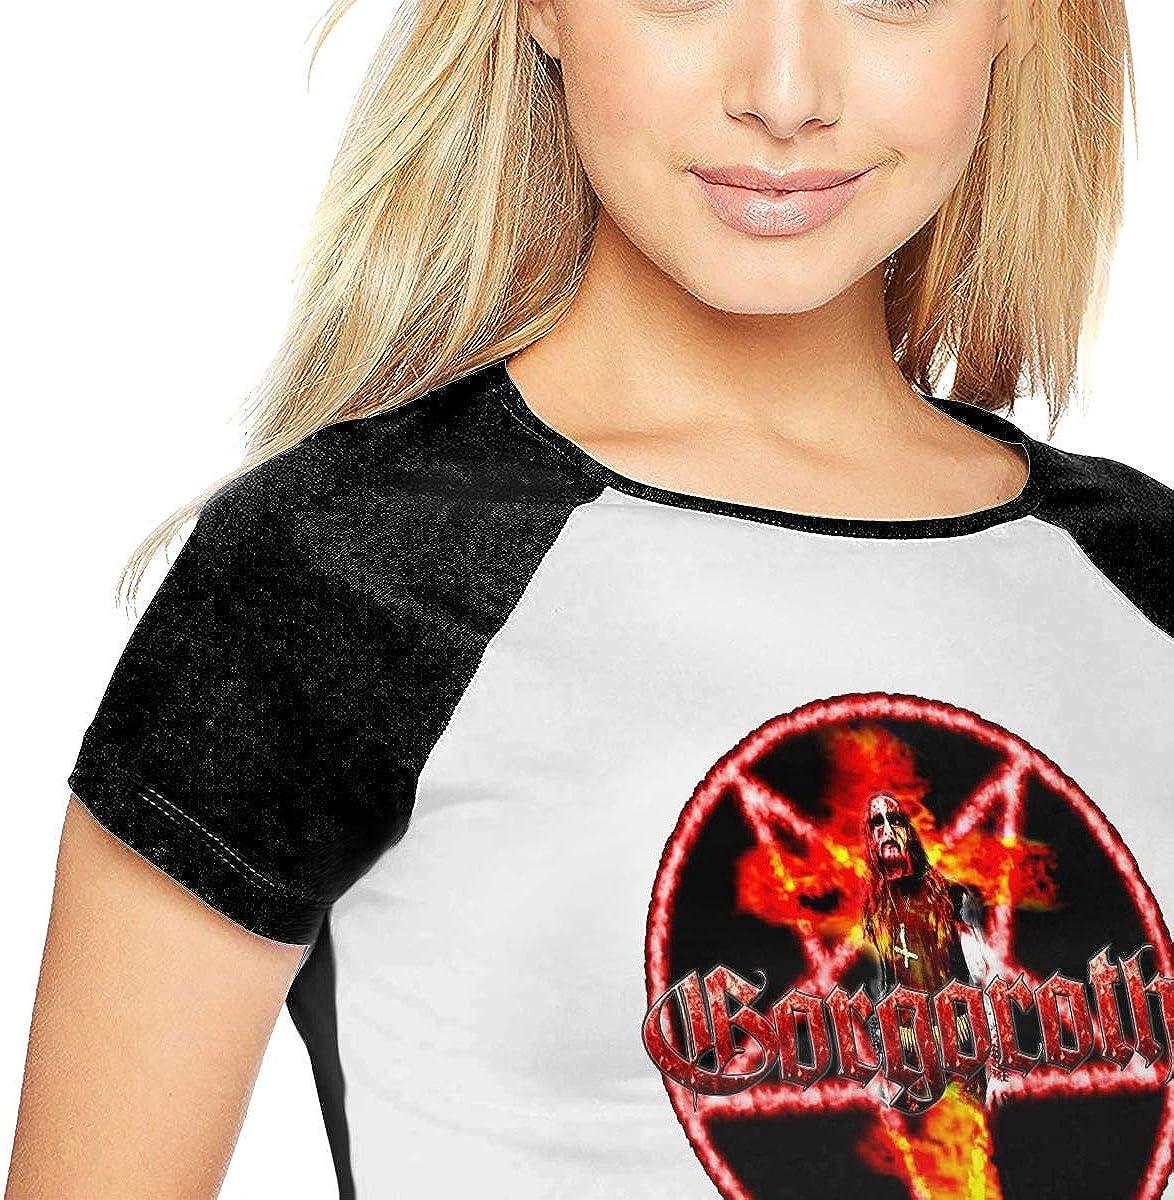 DaihAnle Gorgoroth Womens Individuality Fashion Baseball Short Sleeve Round Neck Print T-Shirt